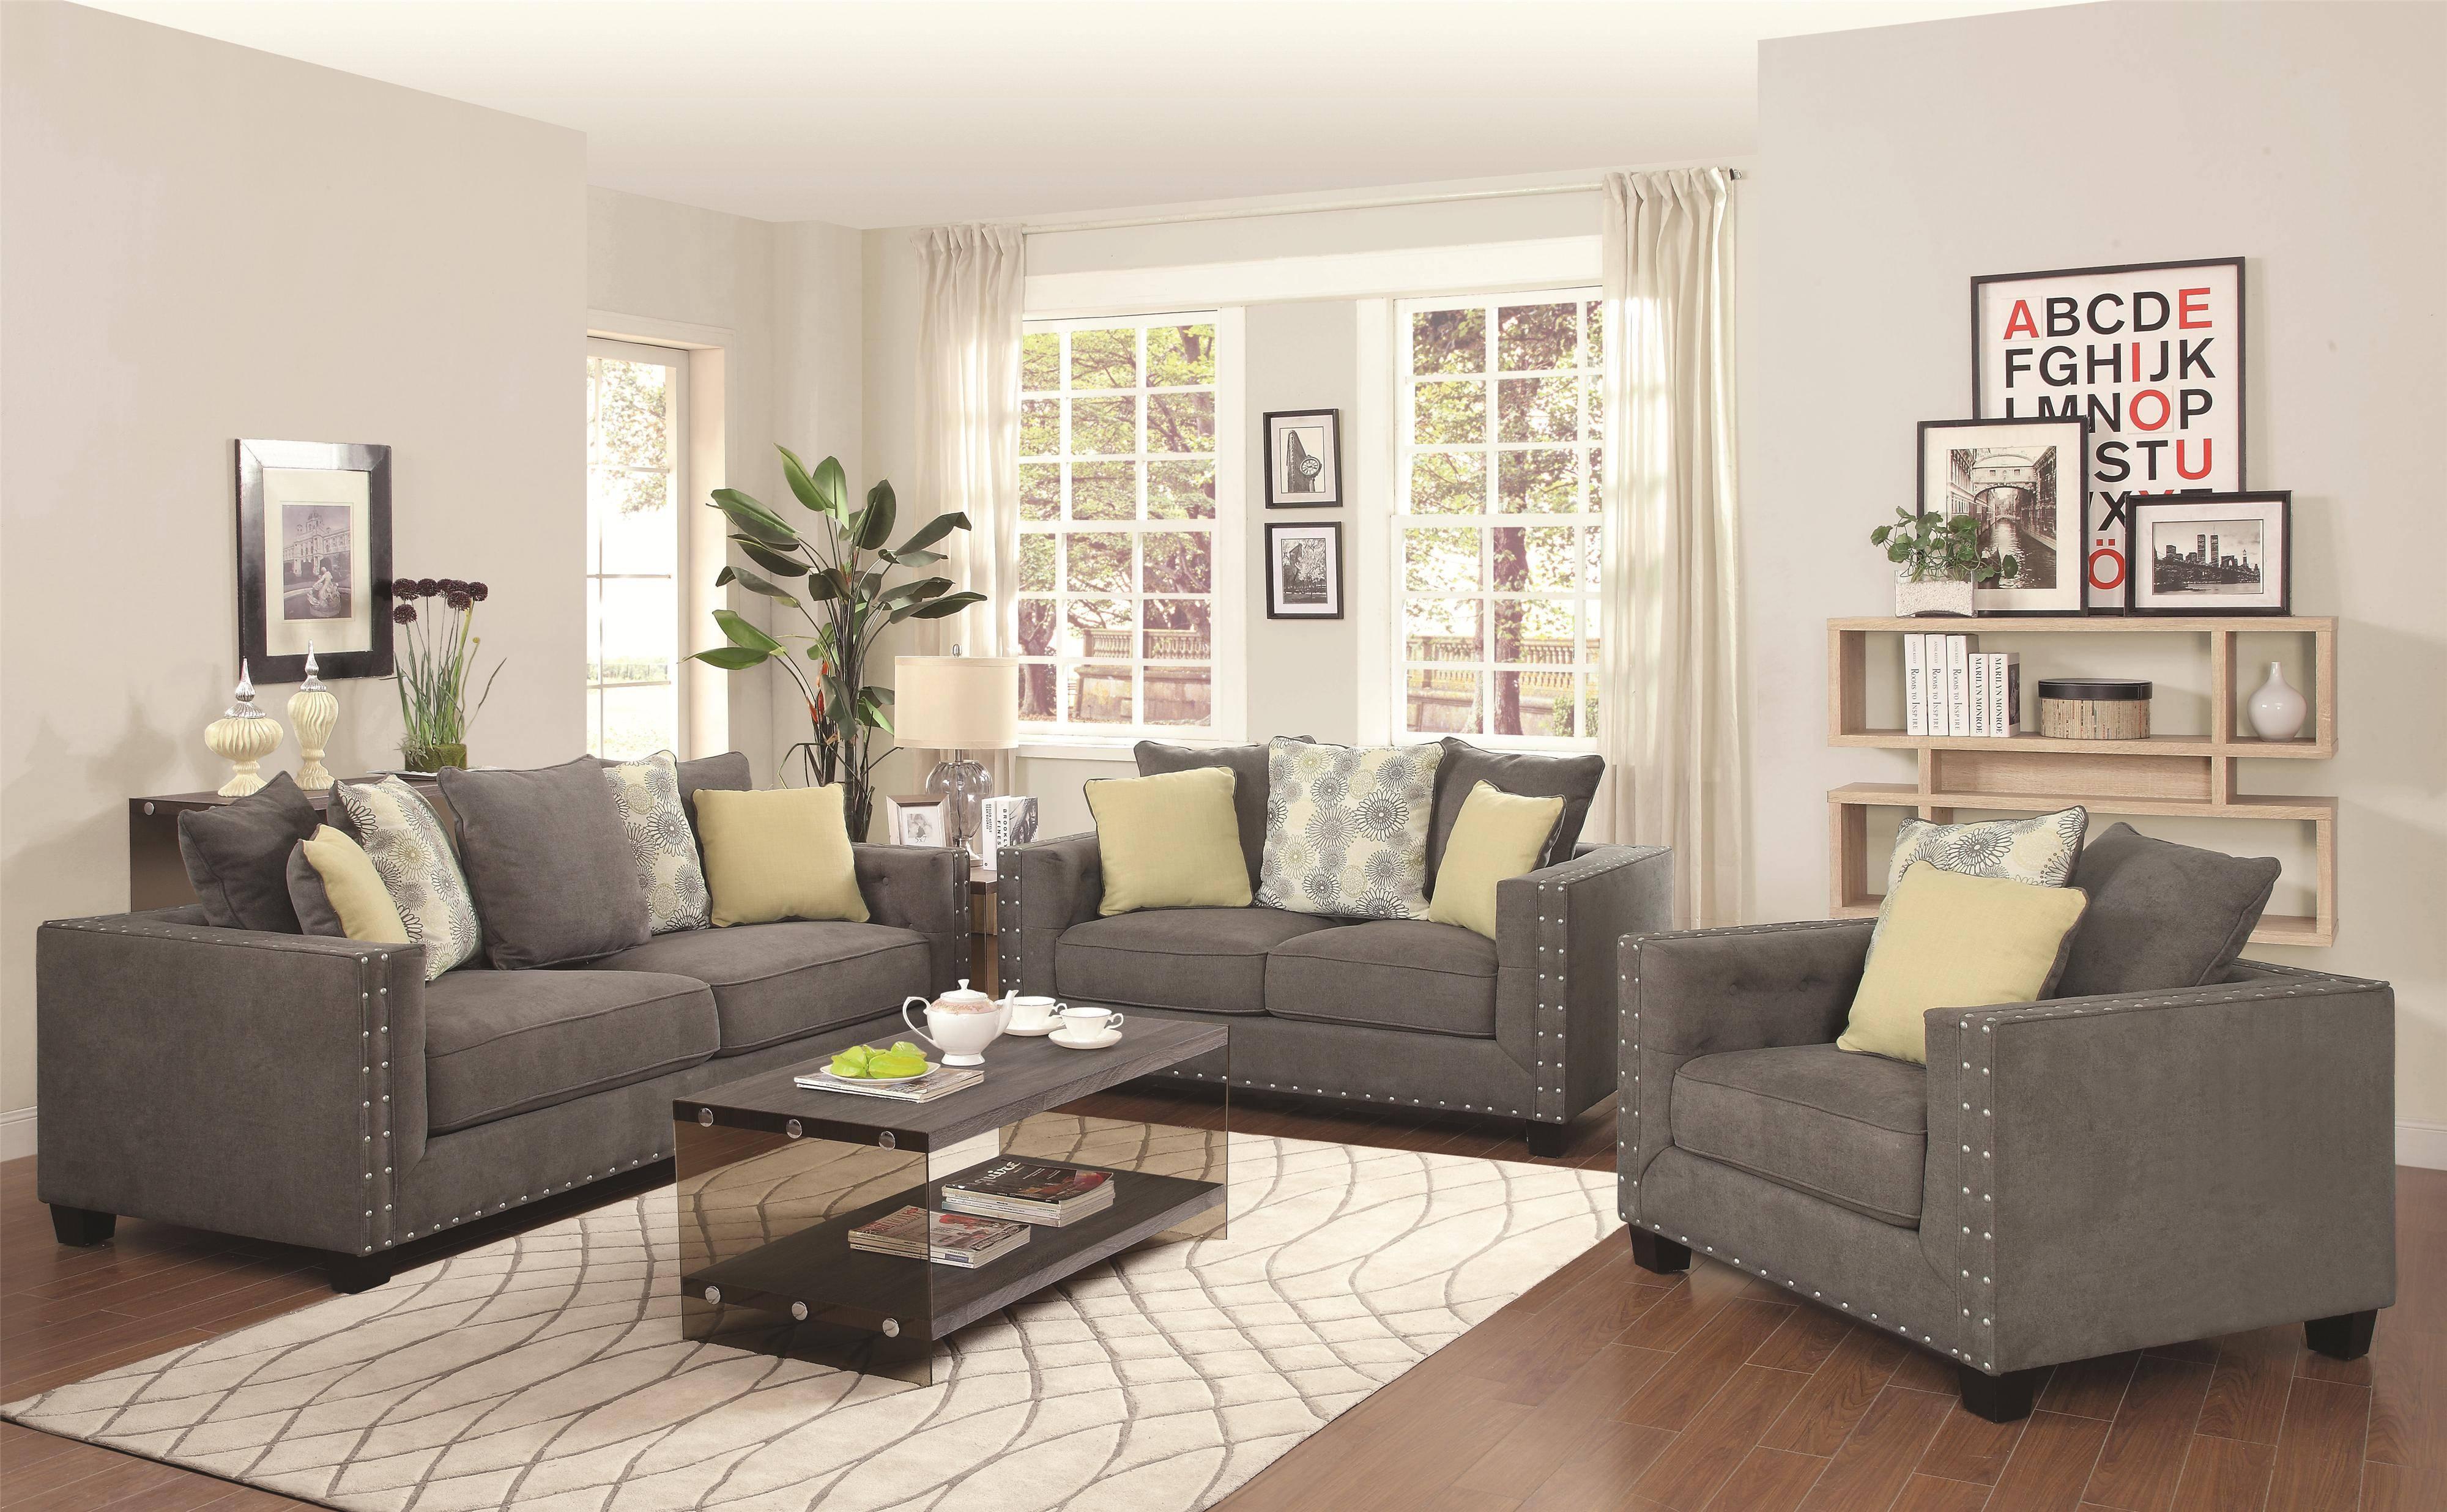 Kelvington Tuxedo Sofa, Loveseat And Chair Set | Furnish Your Needs within Sofa Loveseat and Chair Set (Image 16 of 30)